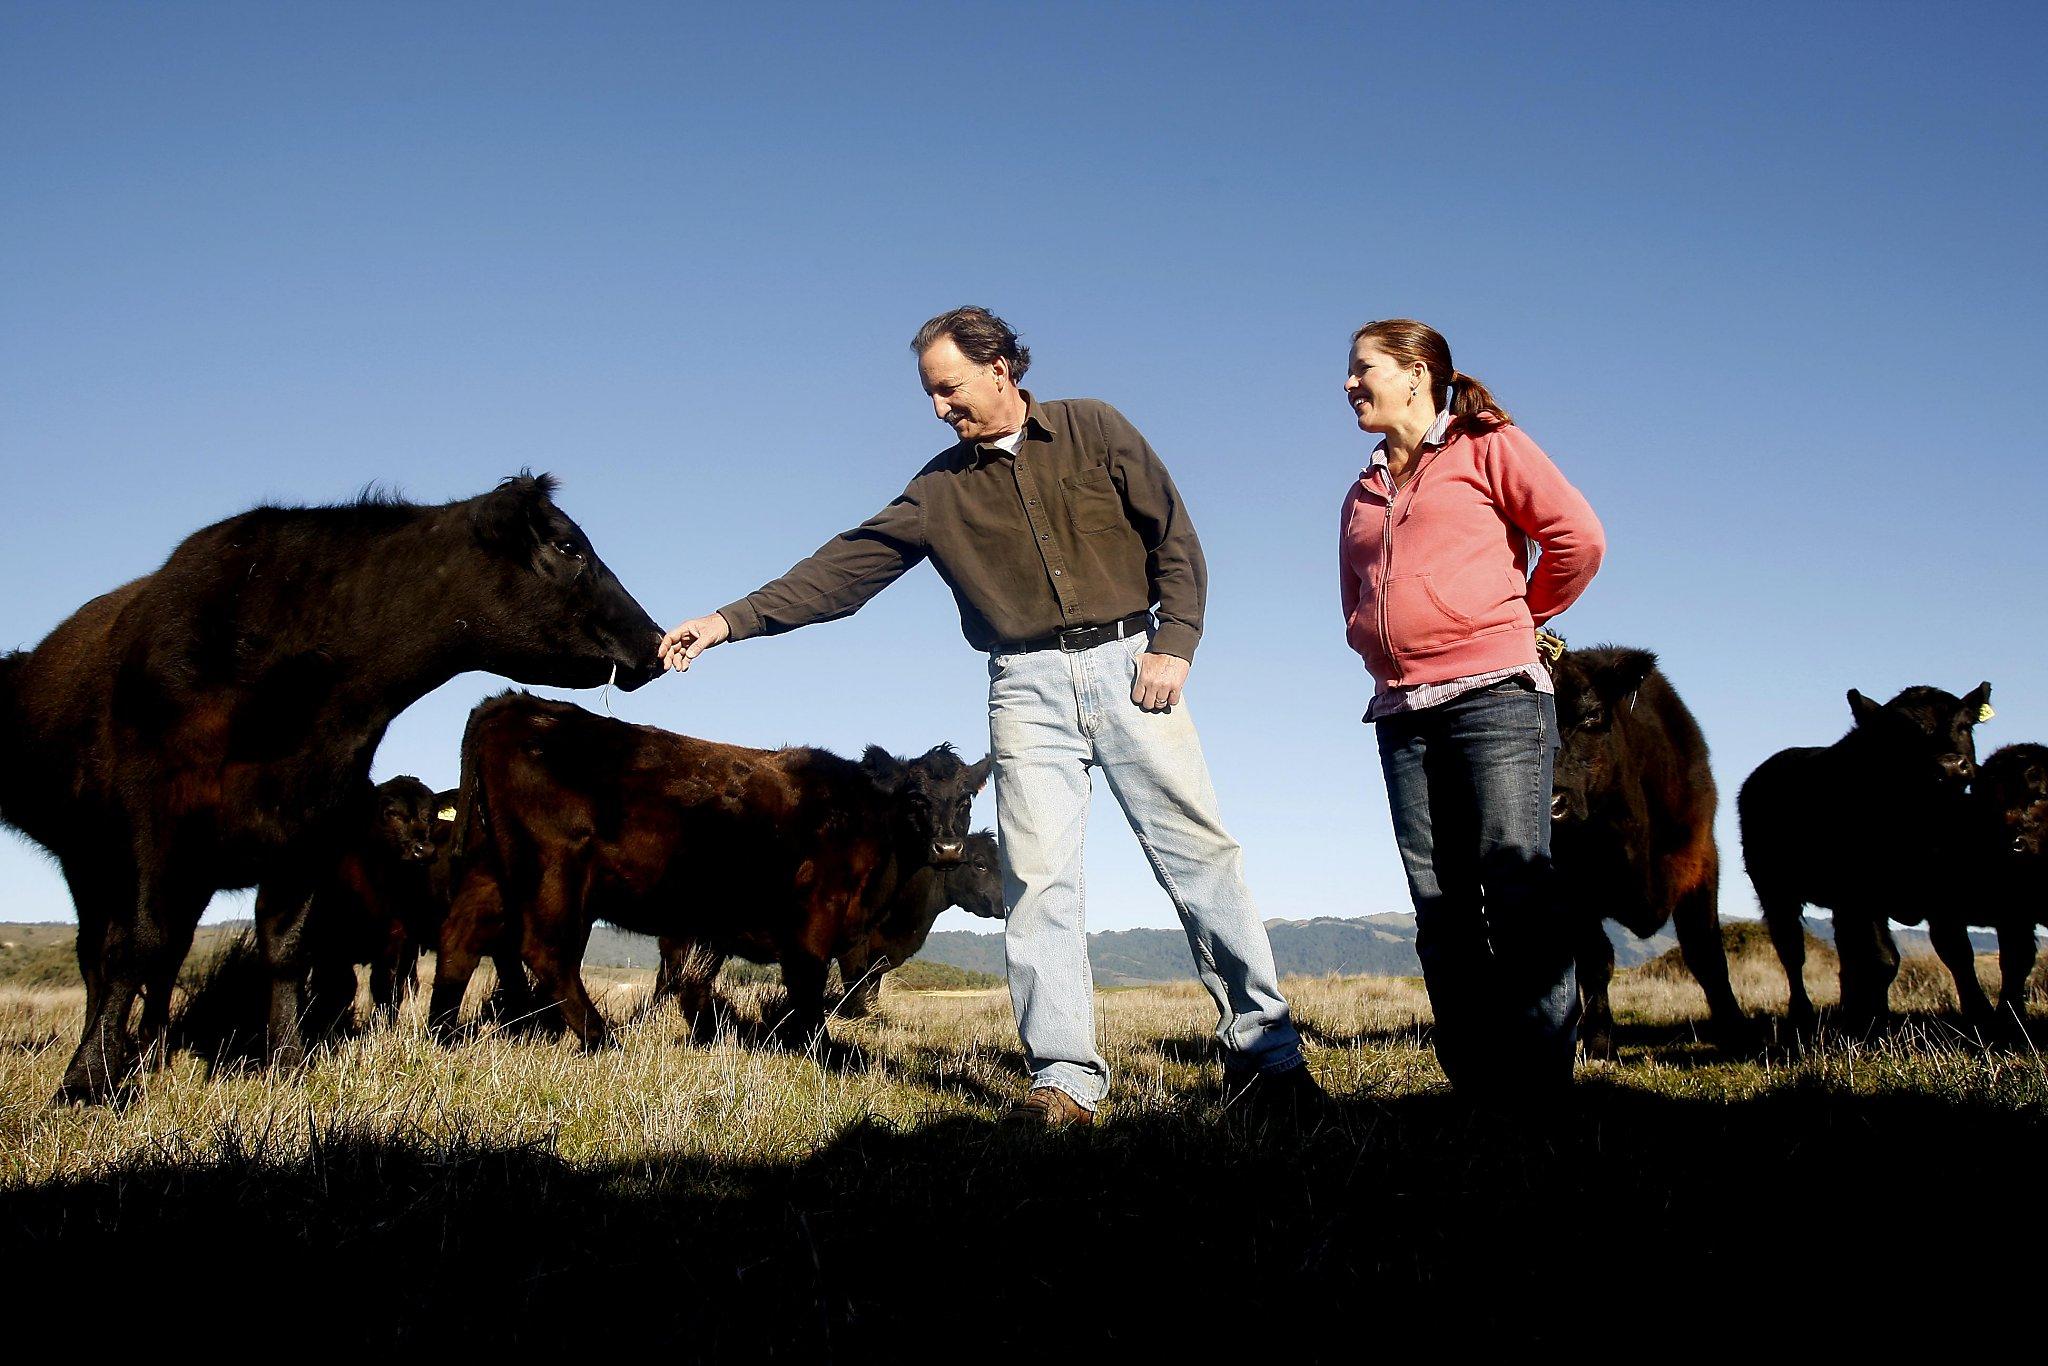 Blue apron niman ranch - Bill Niman Sells Bn Ranch To Blue Apron